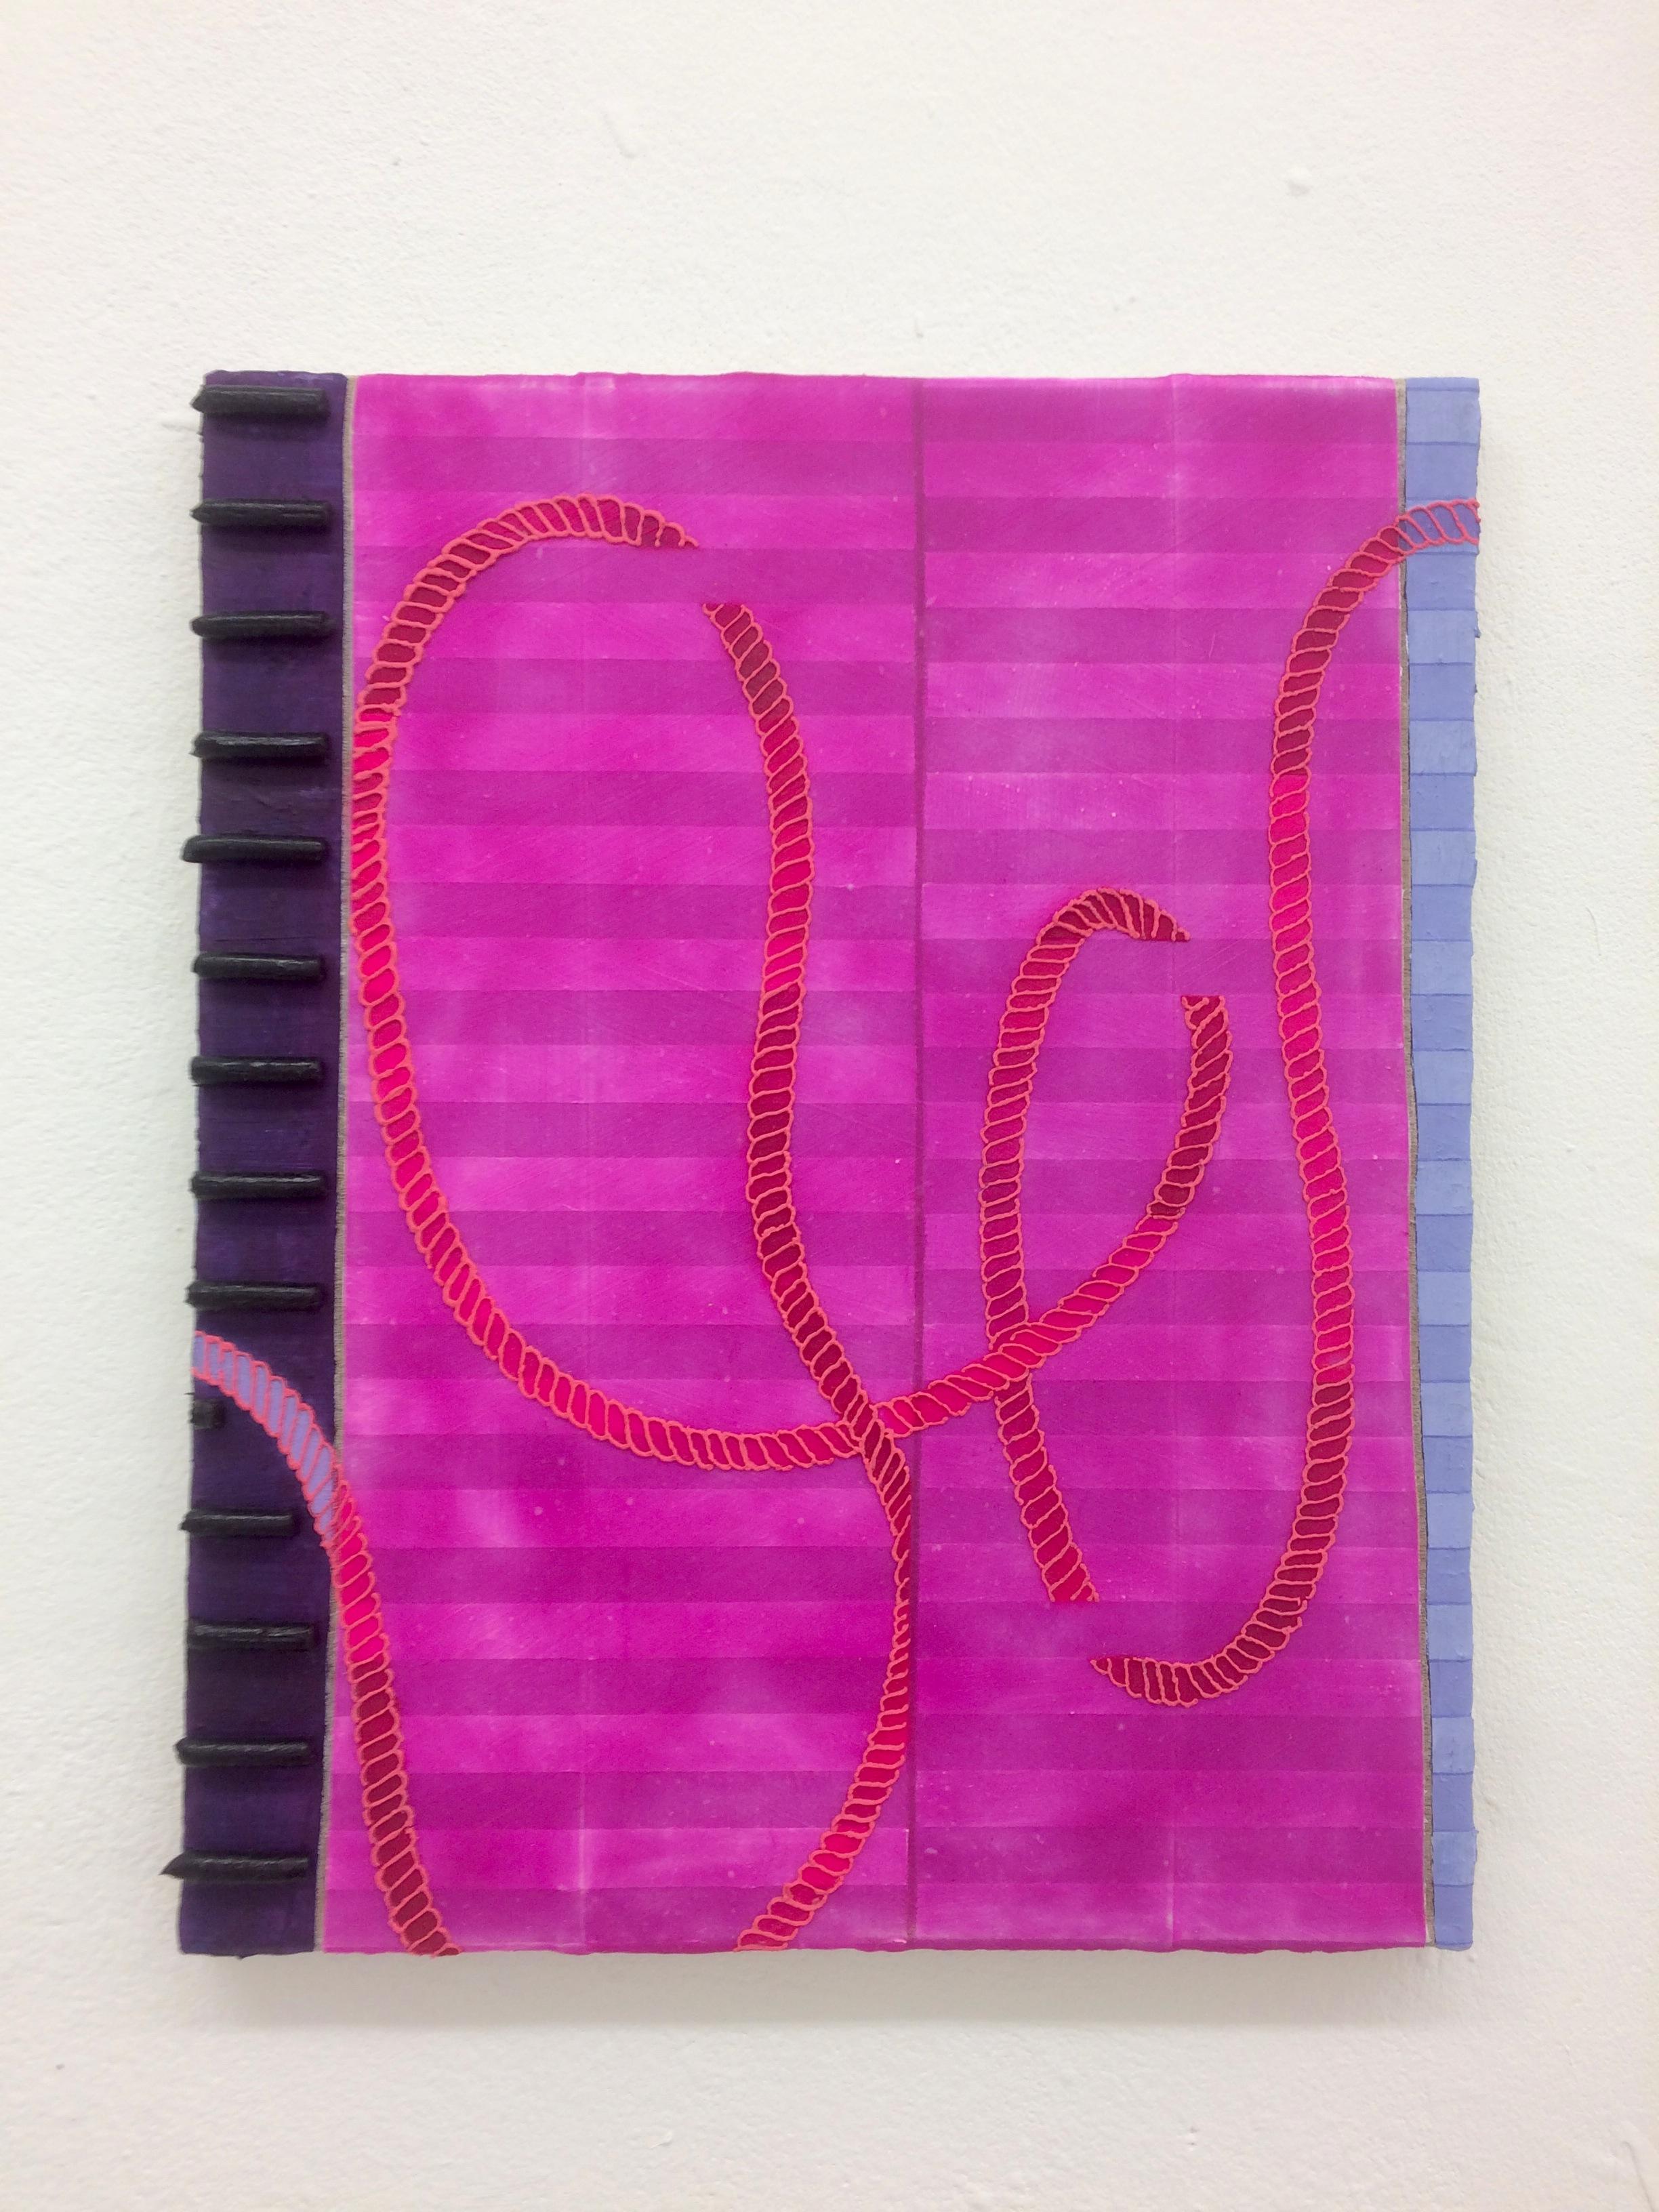 Ryo Kinoshita  Raum der Seile (Room of Ropes), 2018 Oil, Spray, Pigment on Canvas 45 x 56 cm SOLD